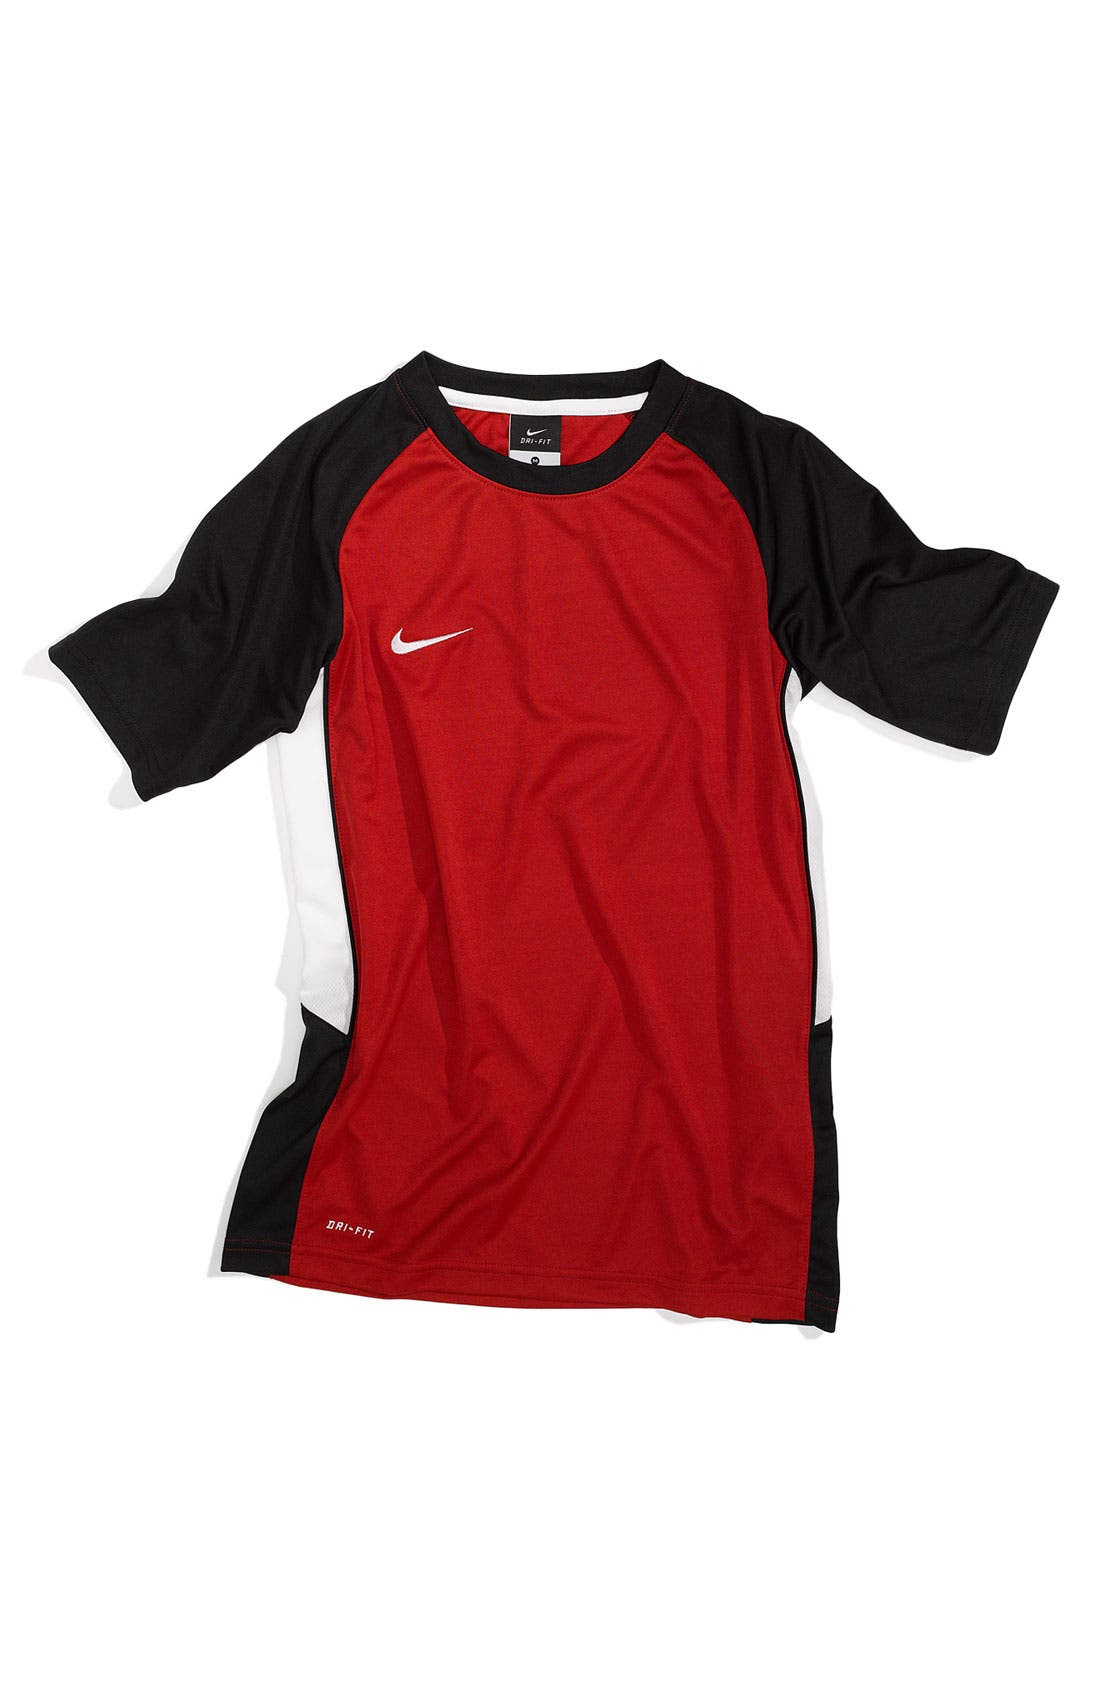 Main Image - Nike 'Dri-FIT - Team' Training Top (Big Boys)